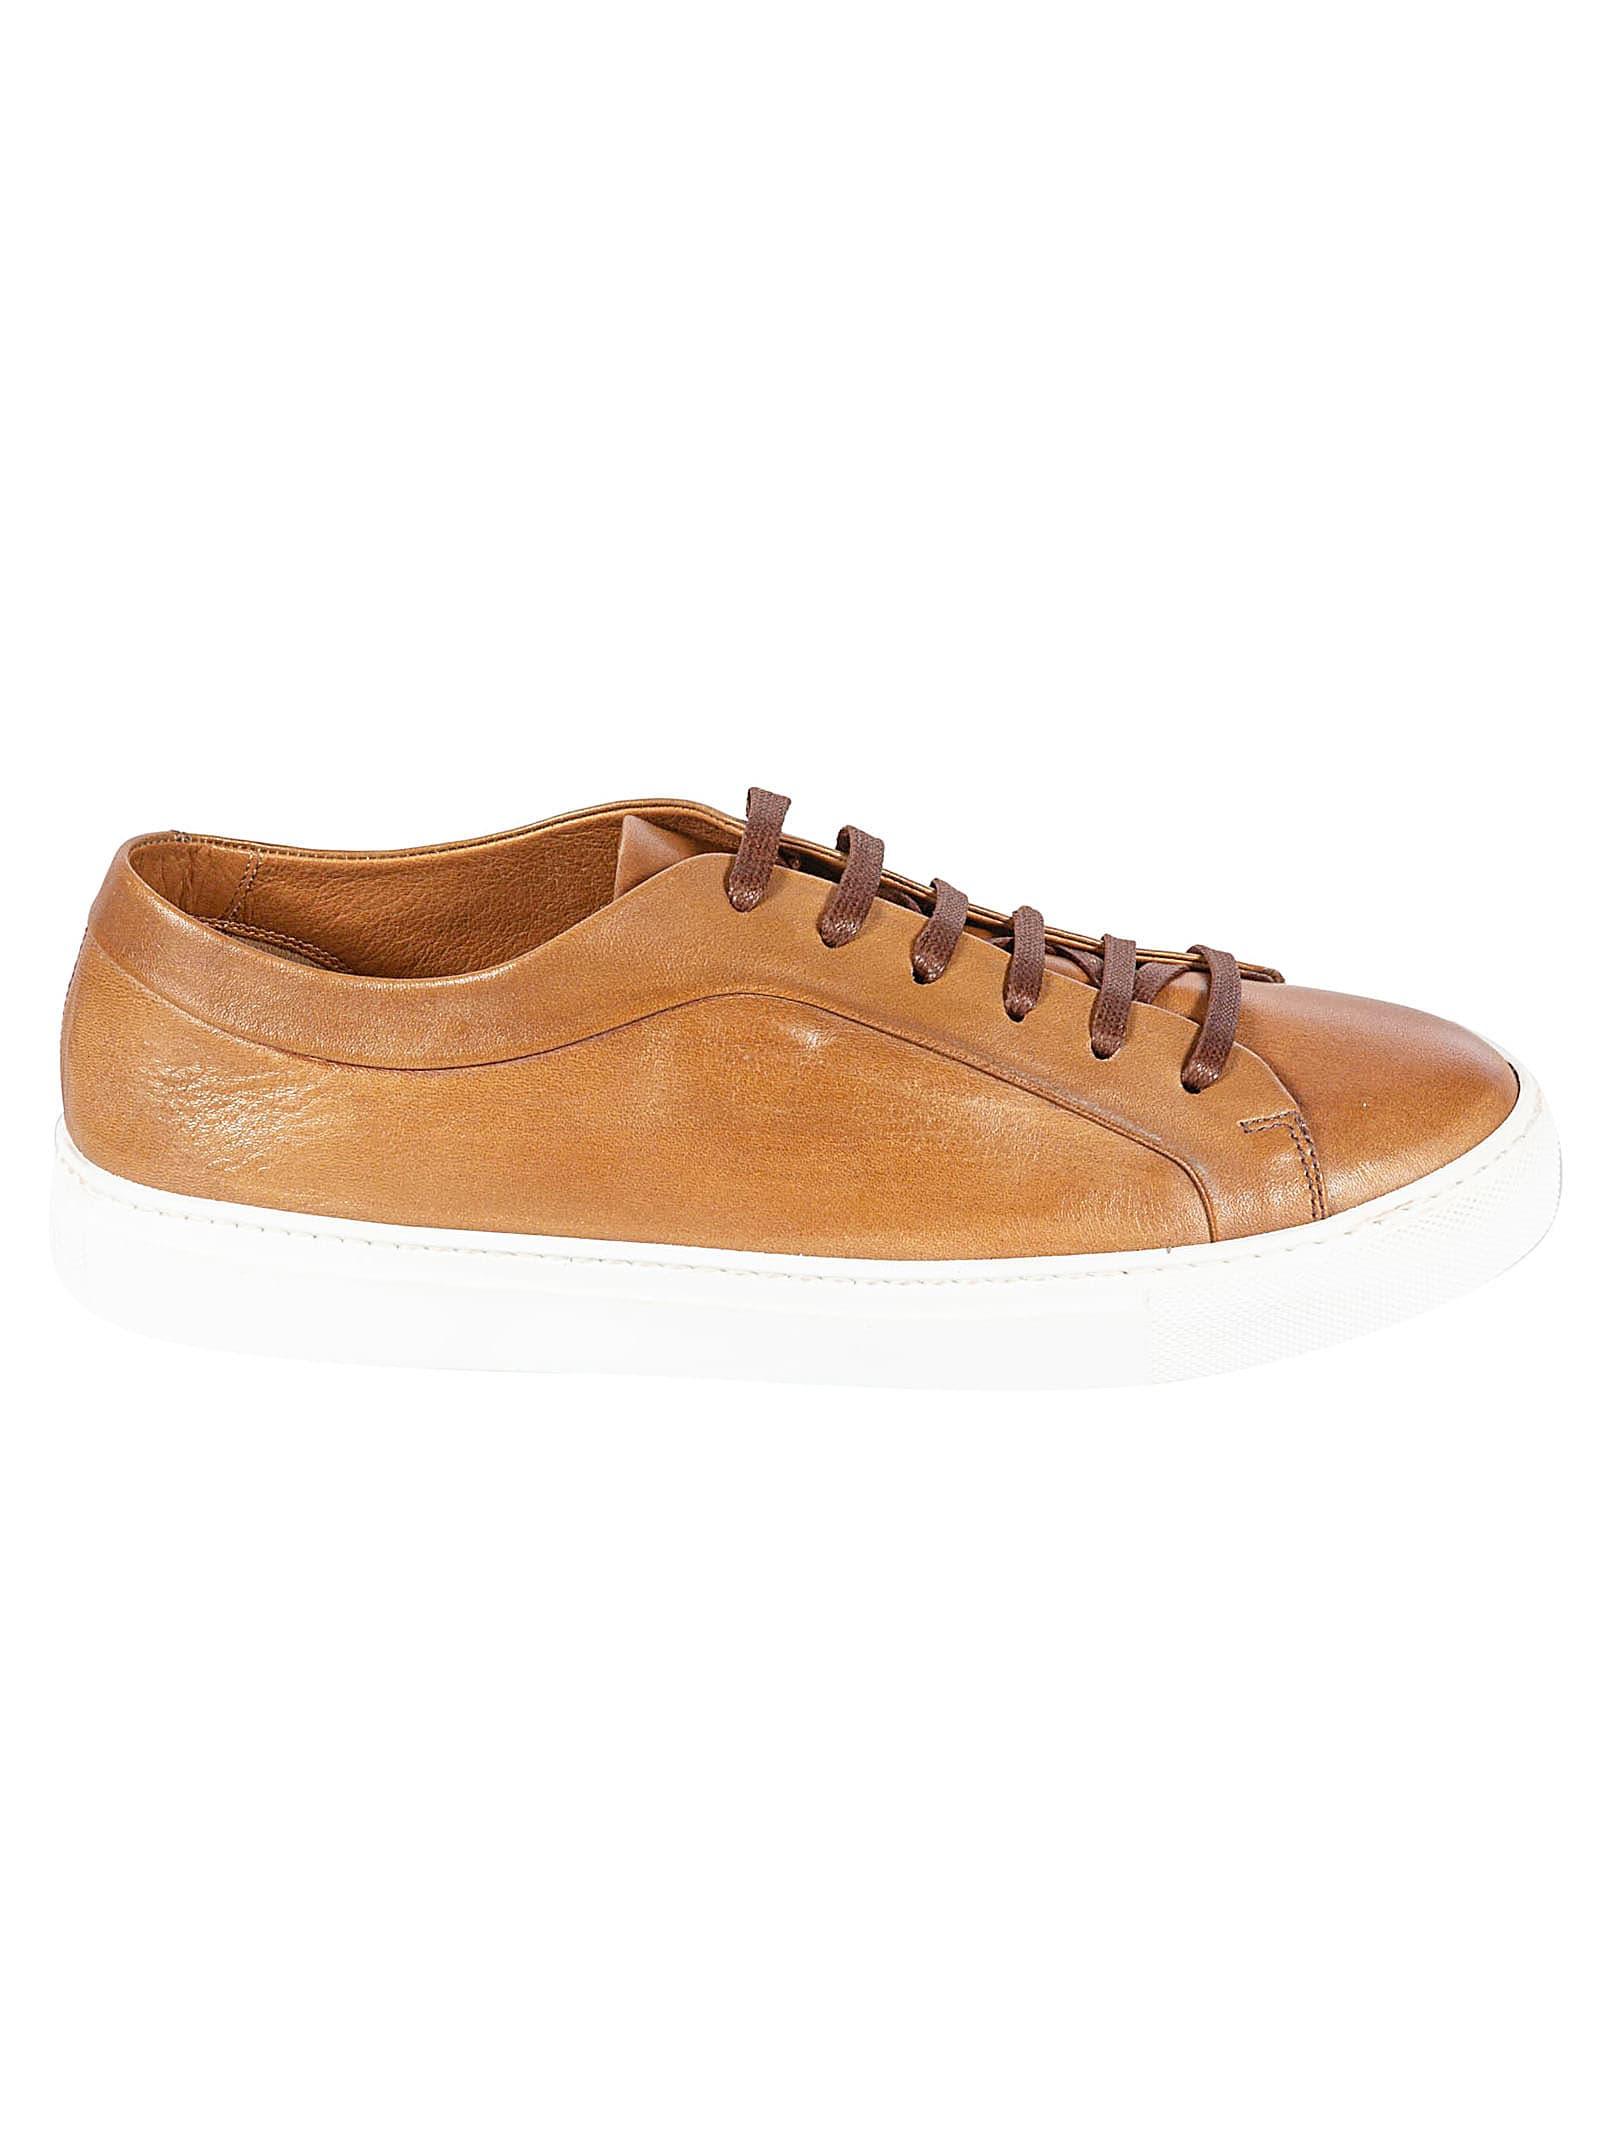 Fratelli Rossetti Classic Sneakers